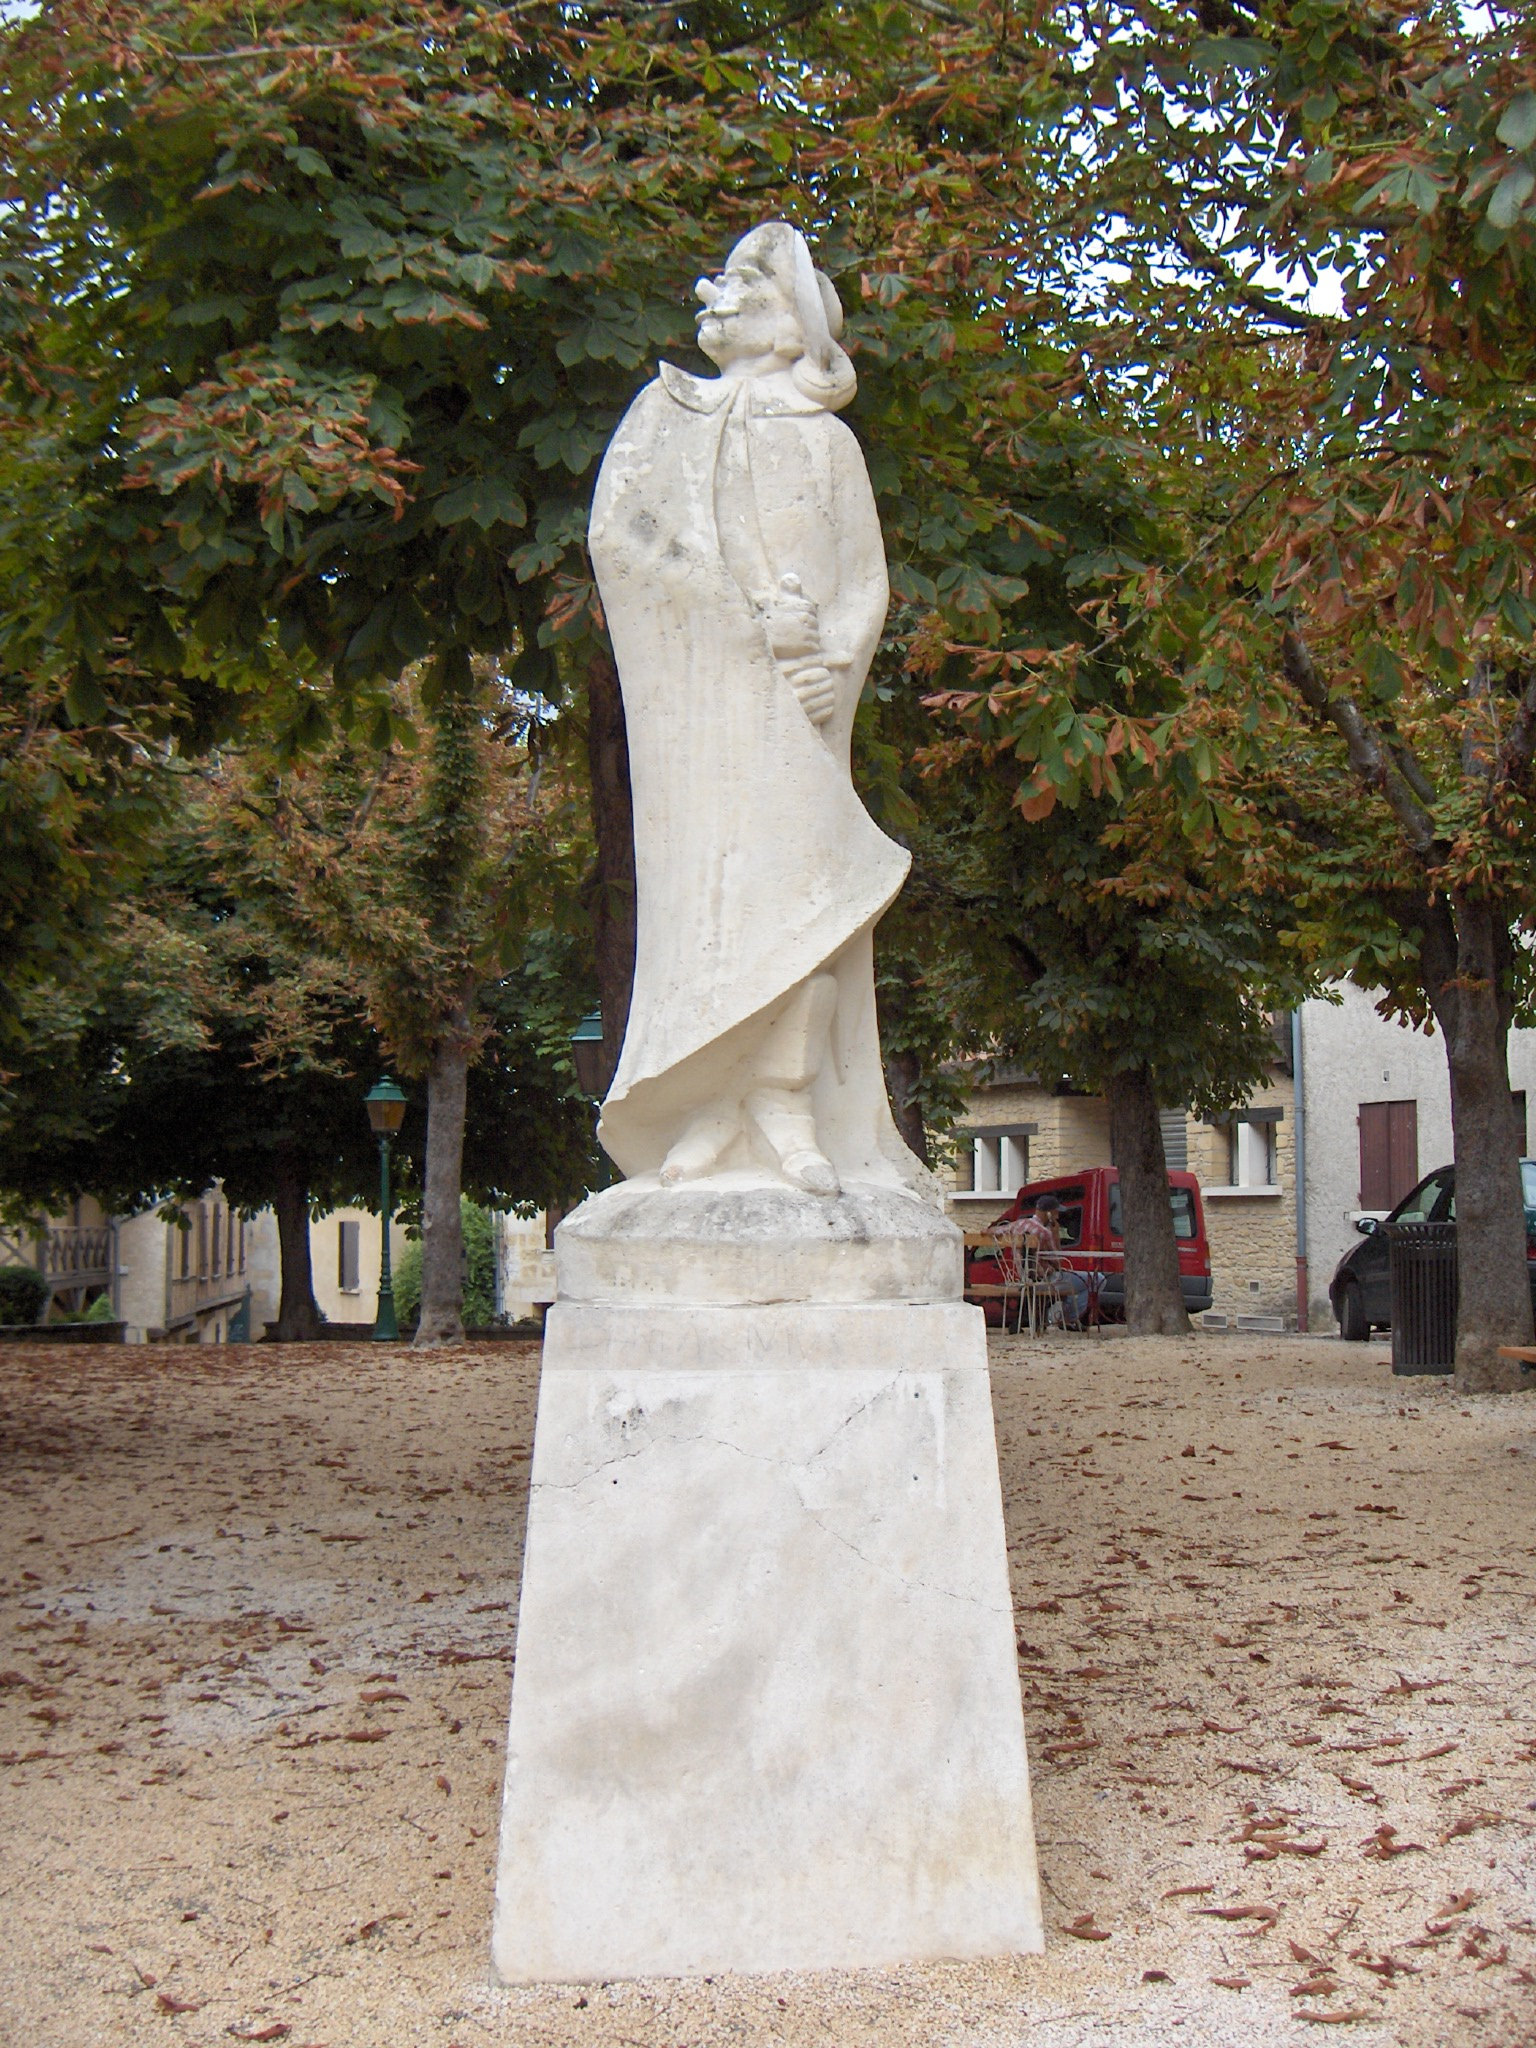 http://operacritiques.free.fr/css/images/cyrano_de_bergerac_statue_edmond_rostand.jpg